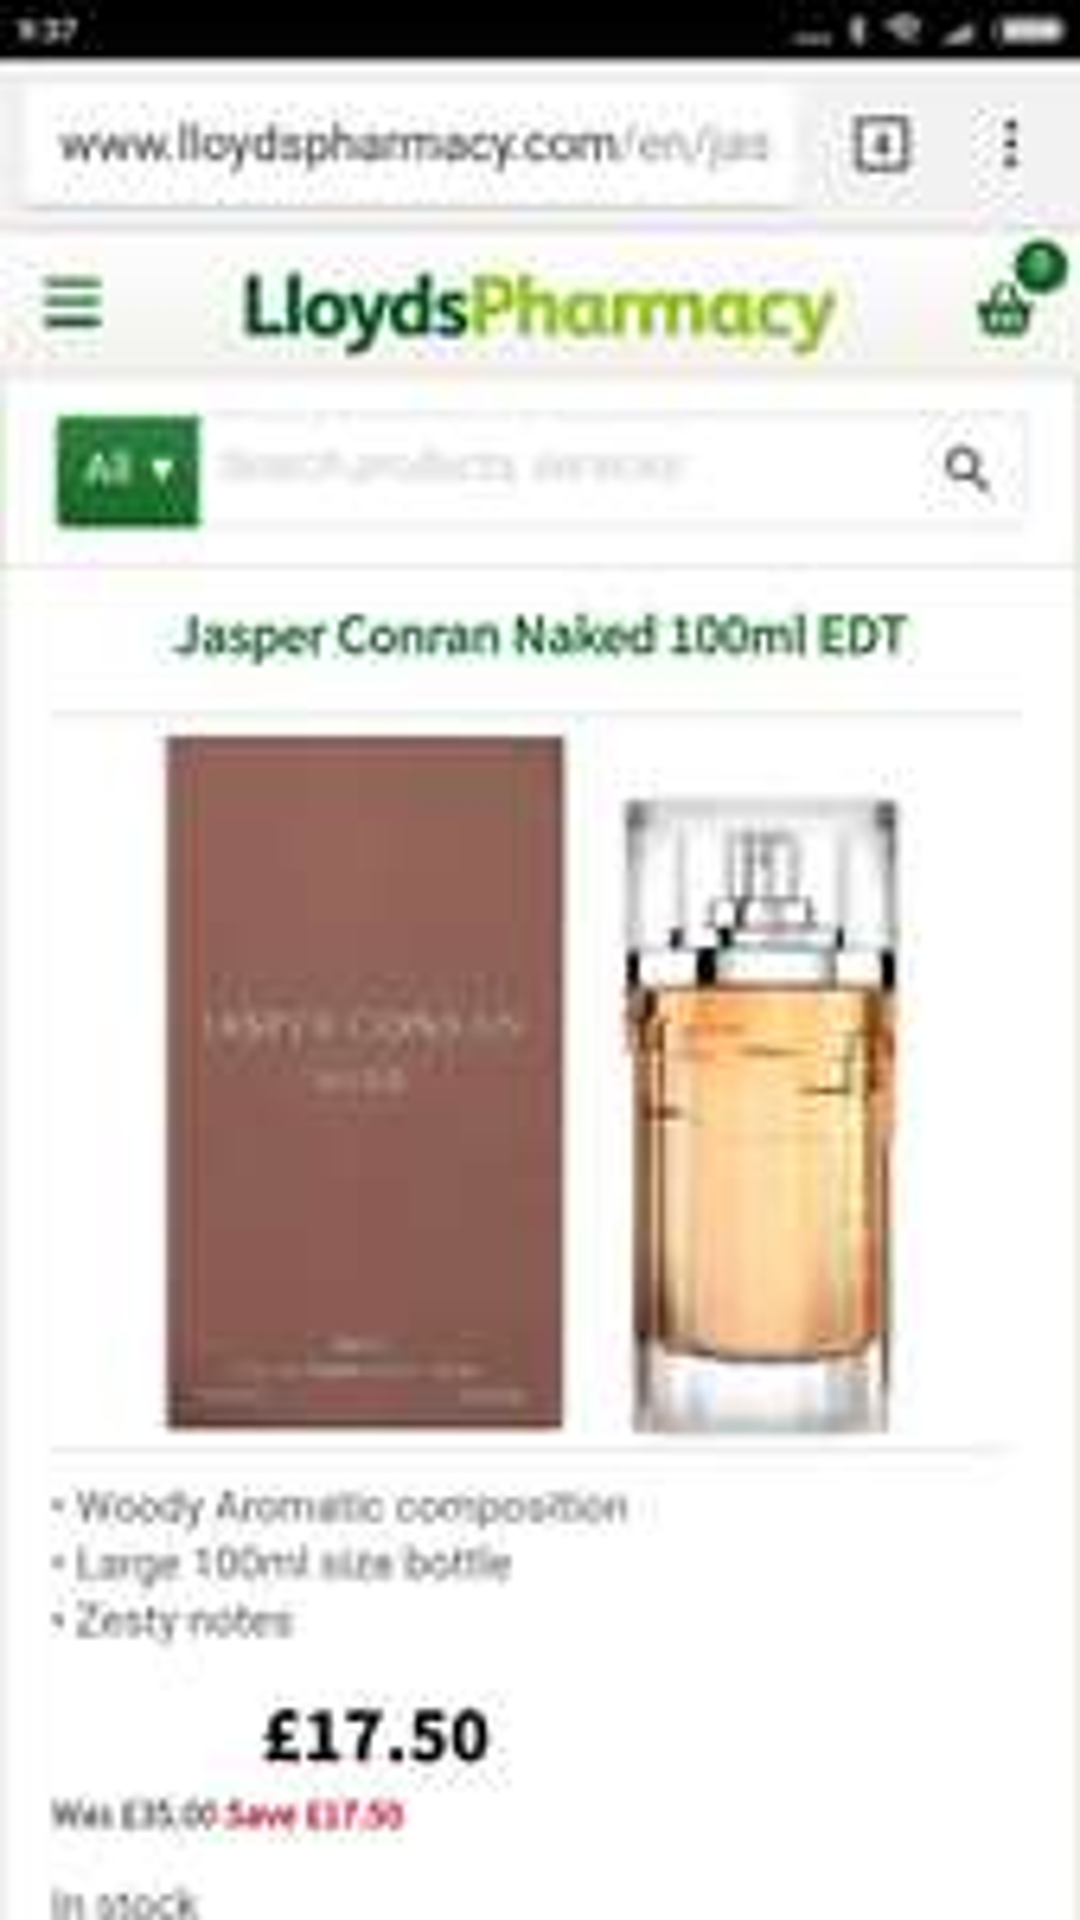 Jasper Conran £17.50 @ Lloyds pharmacy - Free c&c